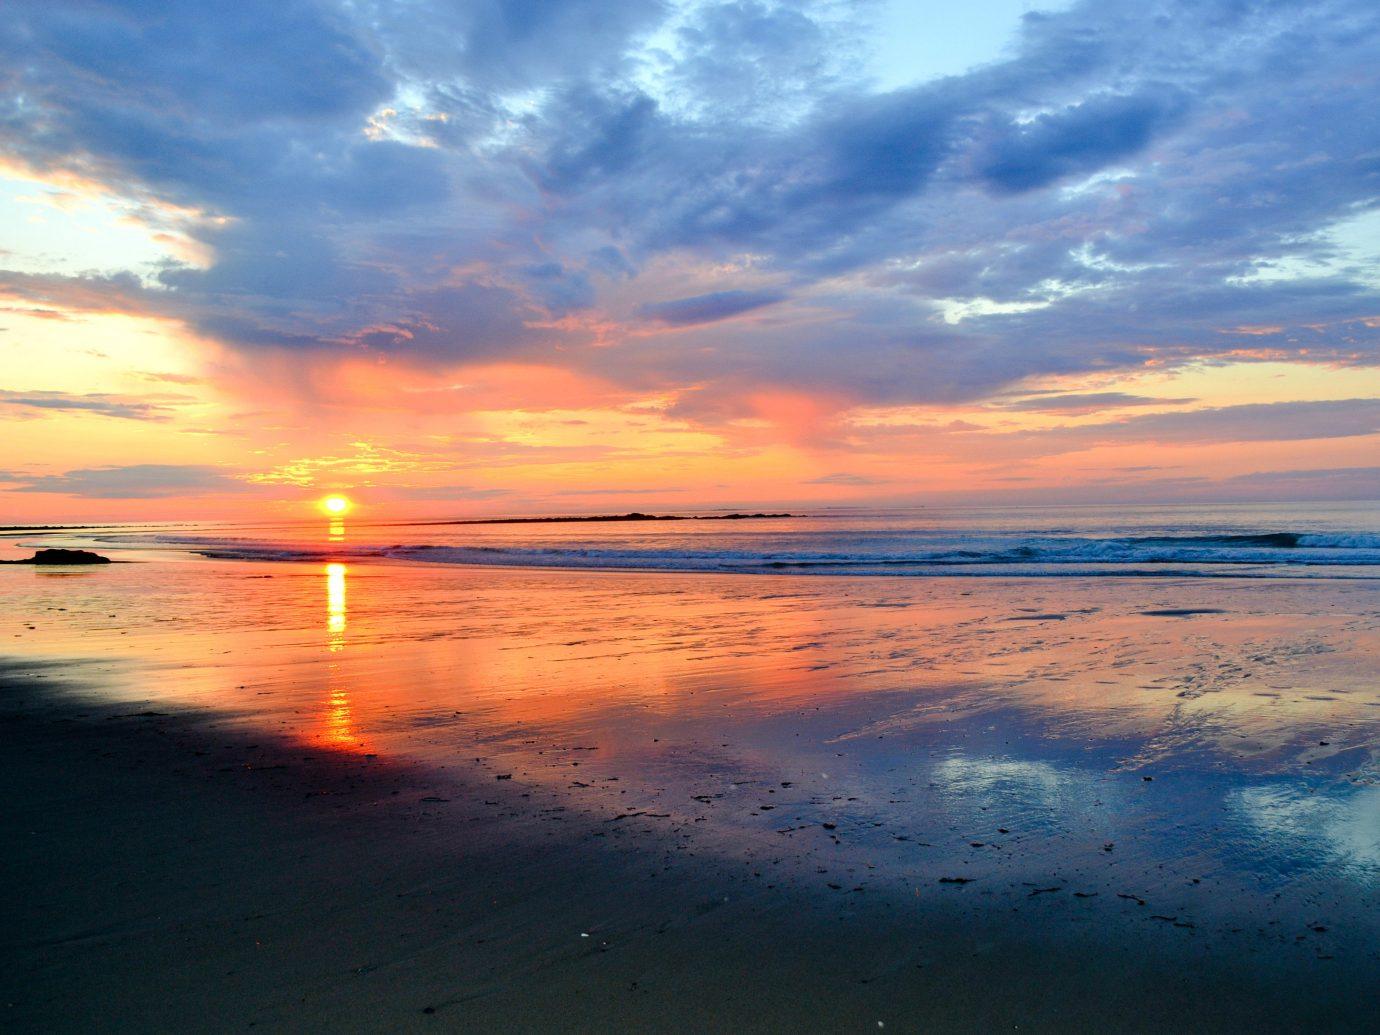 sky outdoor water Sunset sunrise horizon Sea afterglow shore Beach cloud dawn Ocean reflection clouds morning dusk Sun Nature Coast evening sunlight wave wind wave setting cloudy